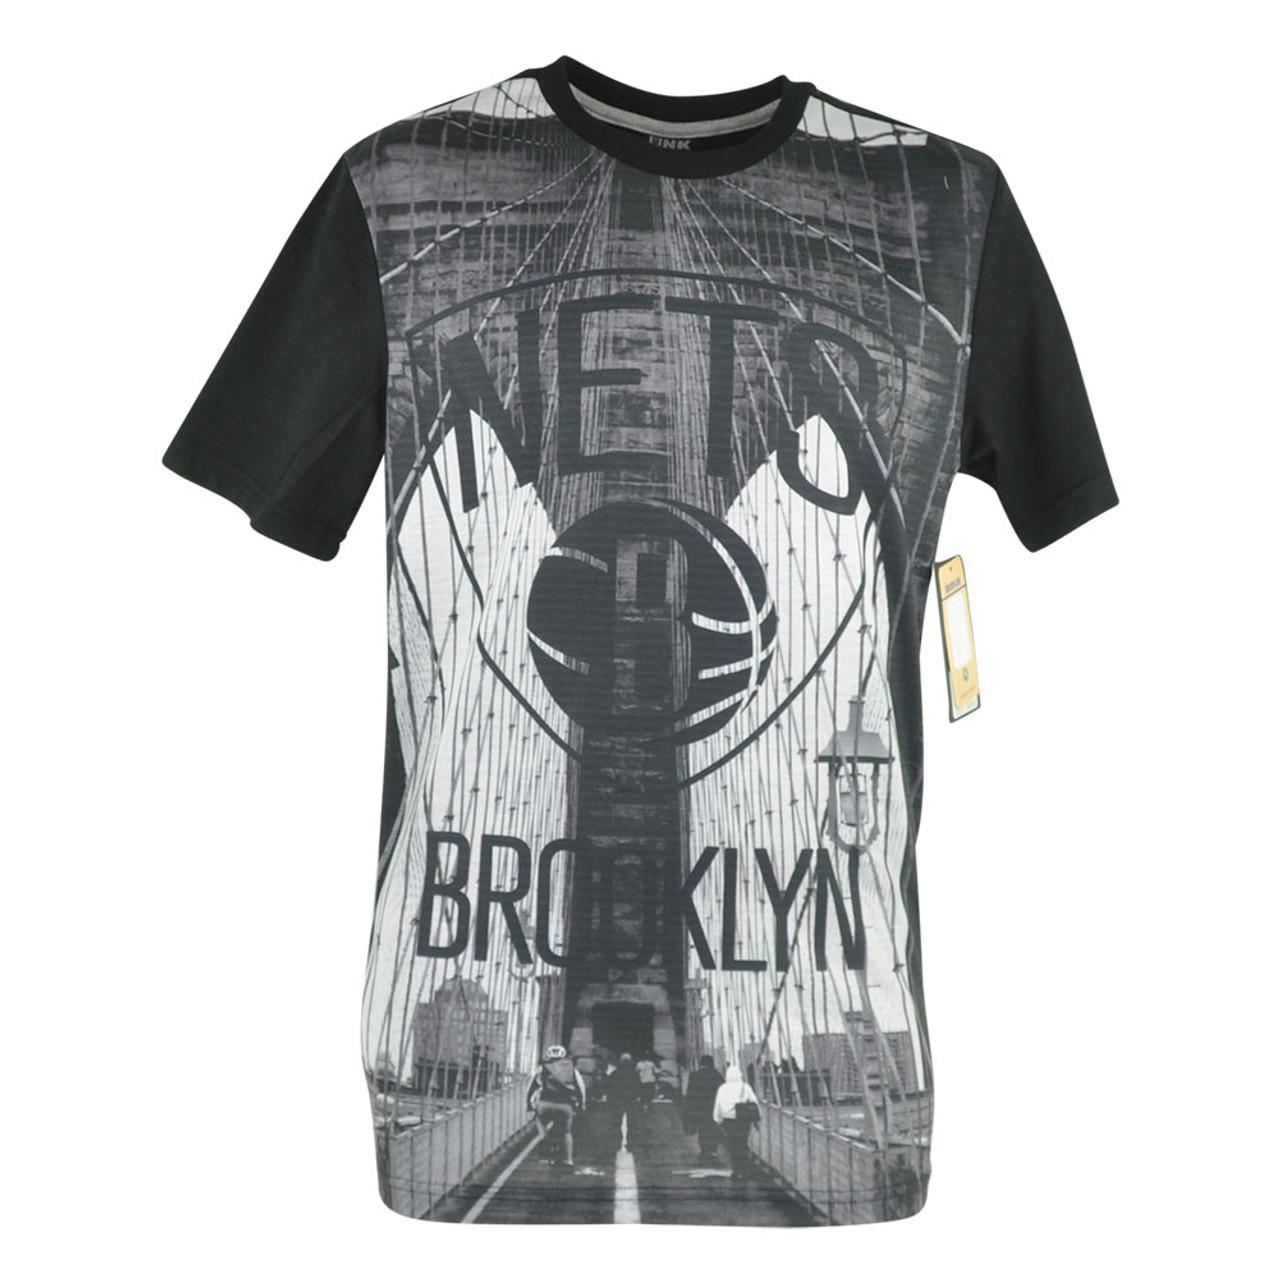 a37ce8366 NBA UNK Brooklyn Nets City Wide Bridge Graphic Tshirt Basketball Mens Tee -  Cap Store Online.com